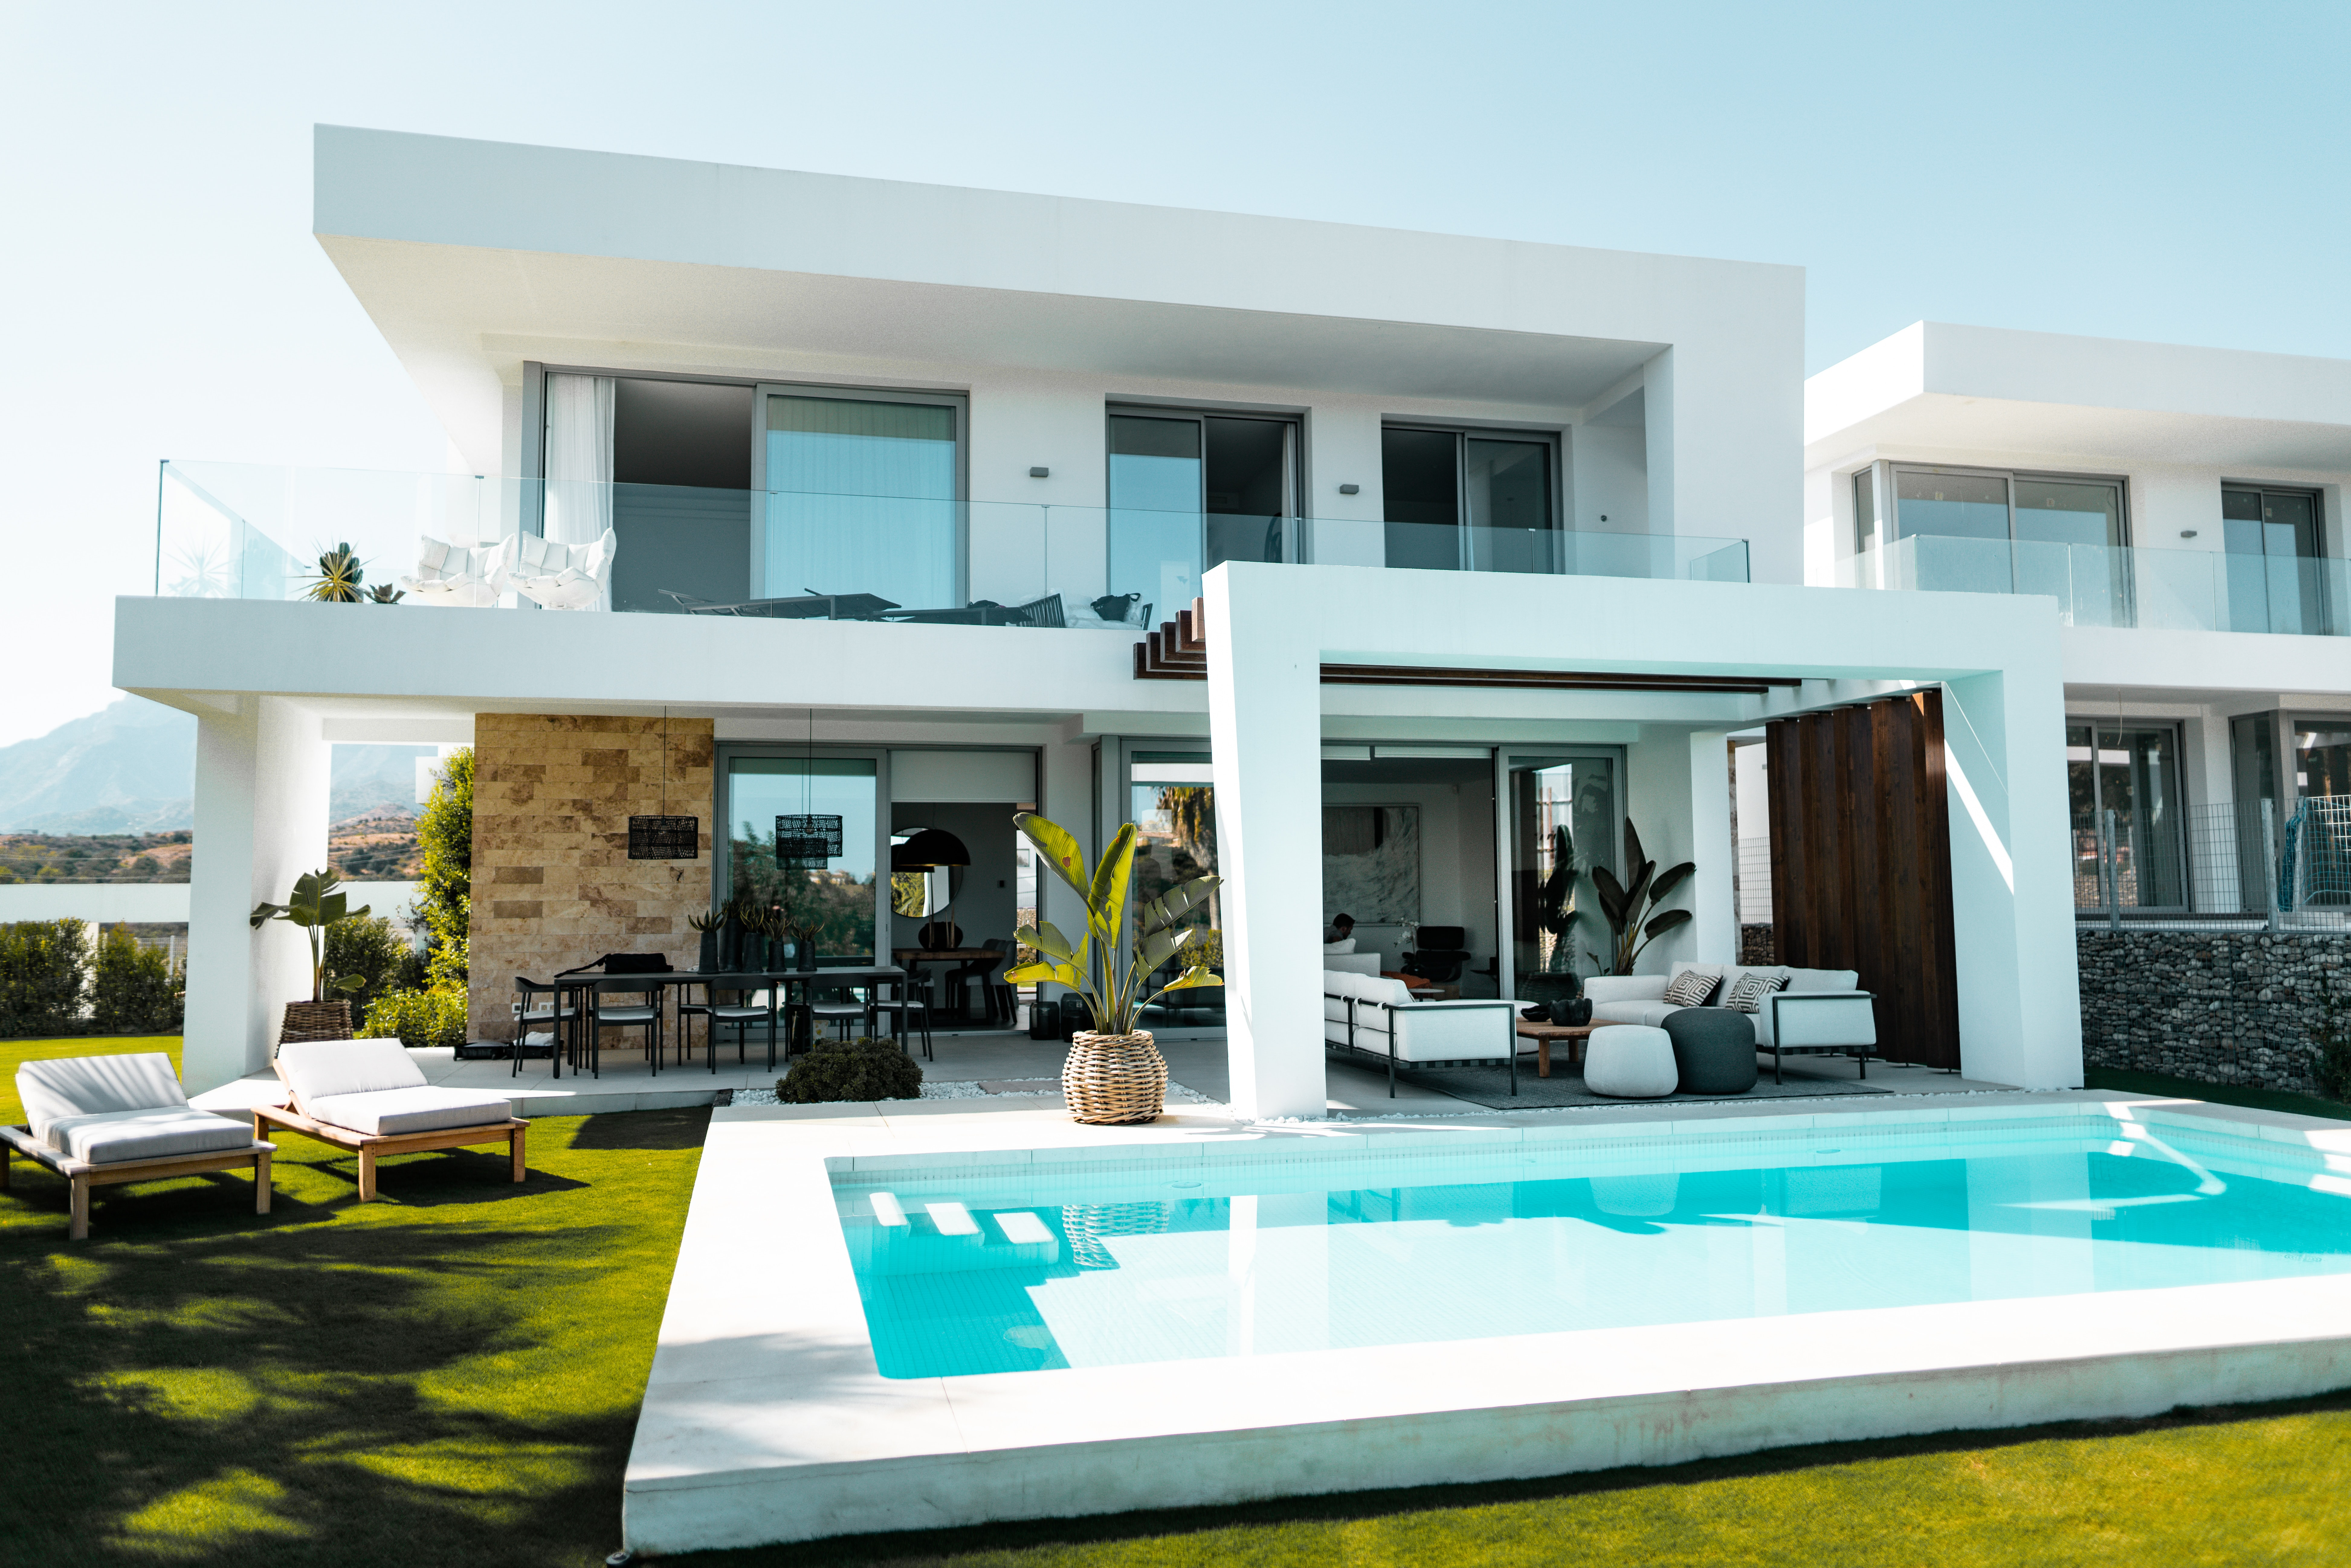 Preço das casas de luxo está a subir ao ritmo mais rápido desde 2016